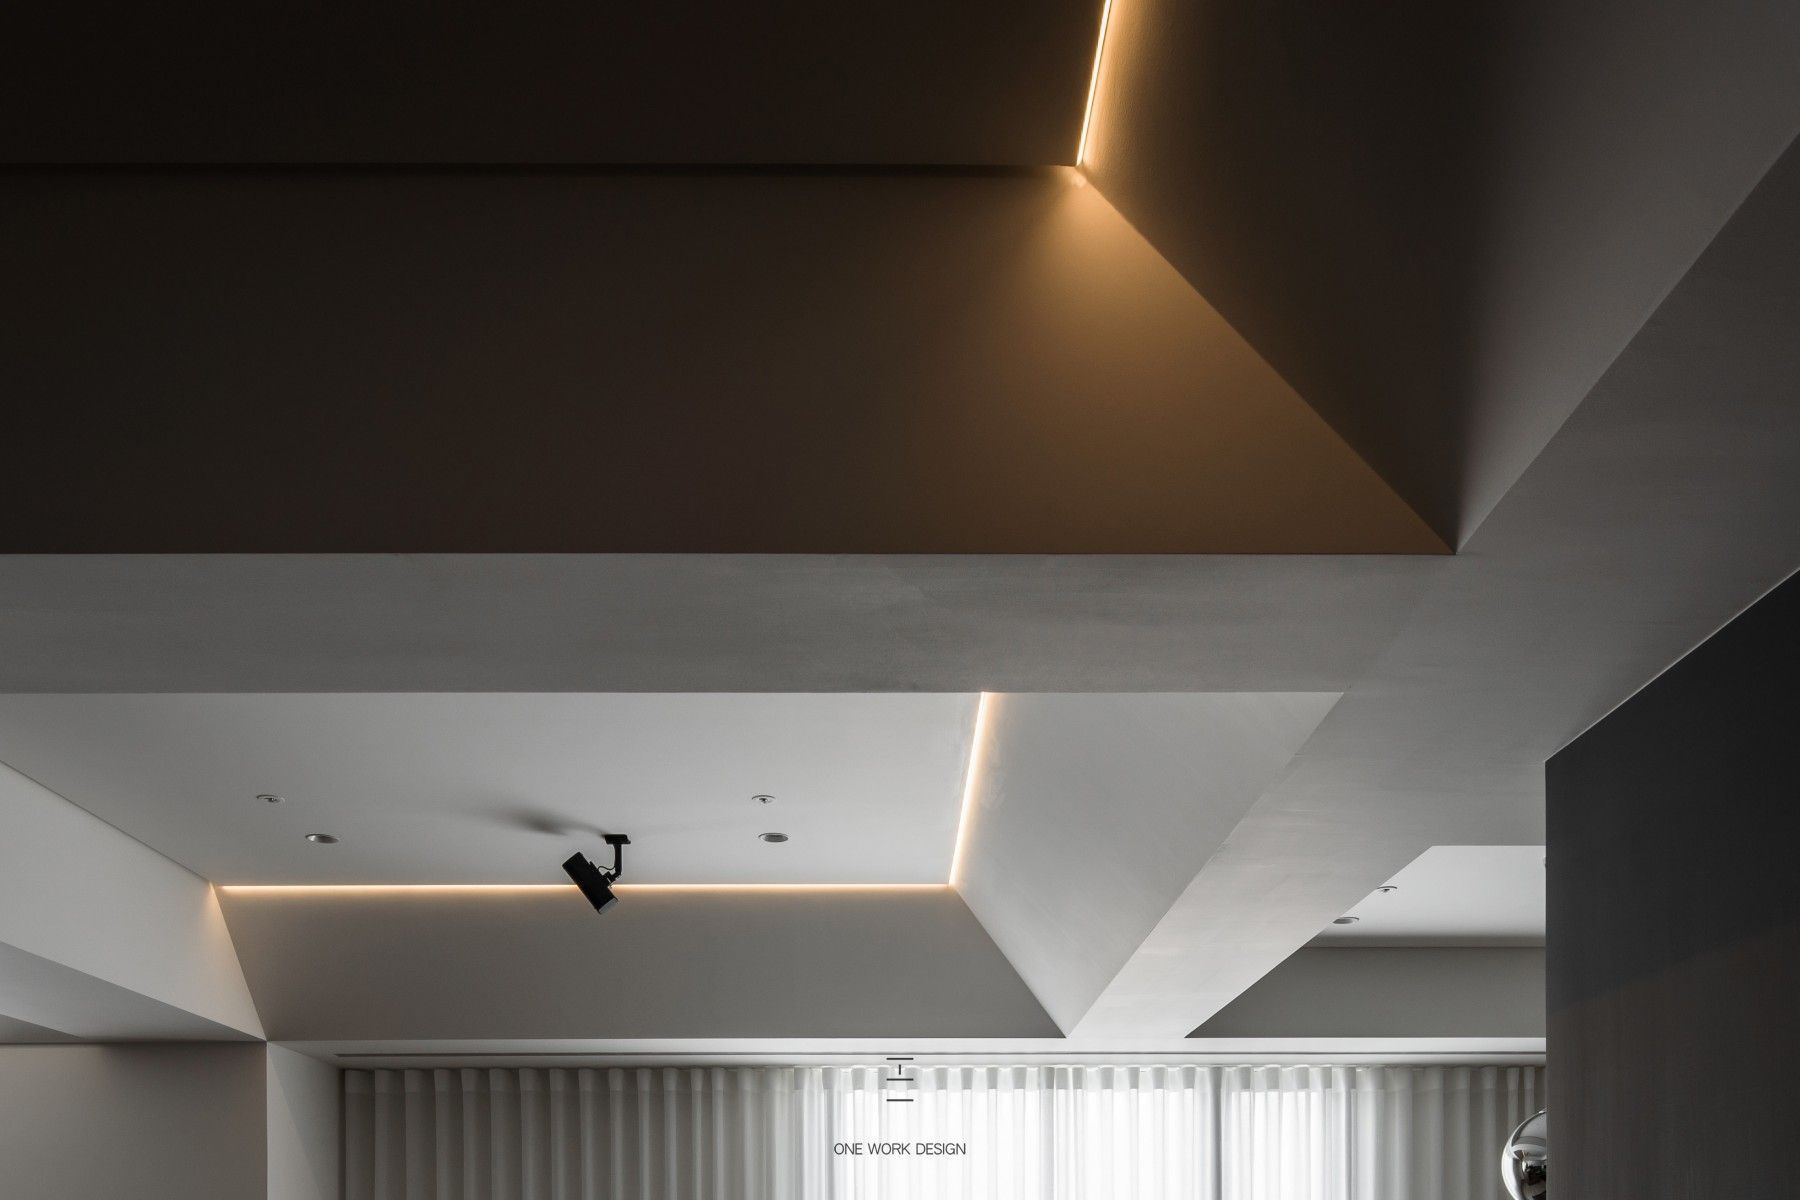 W宅 u2013 工一設計 #falseceilingideasmirror false ceiling ideas mirror